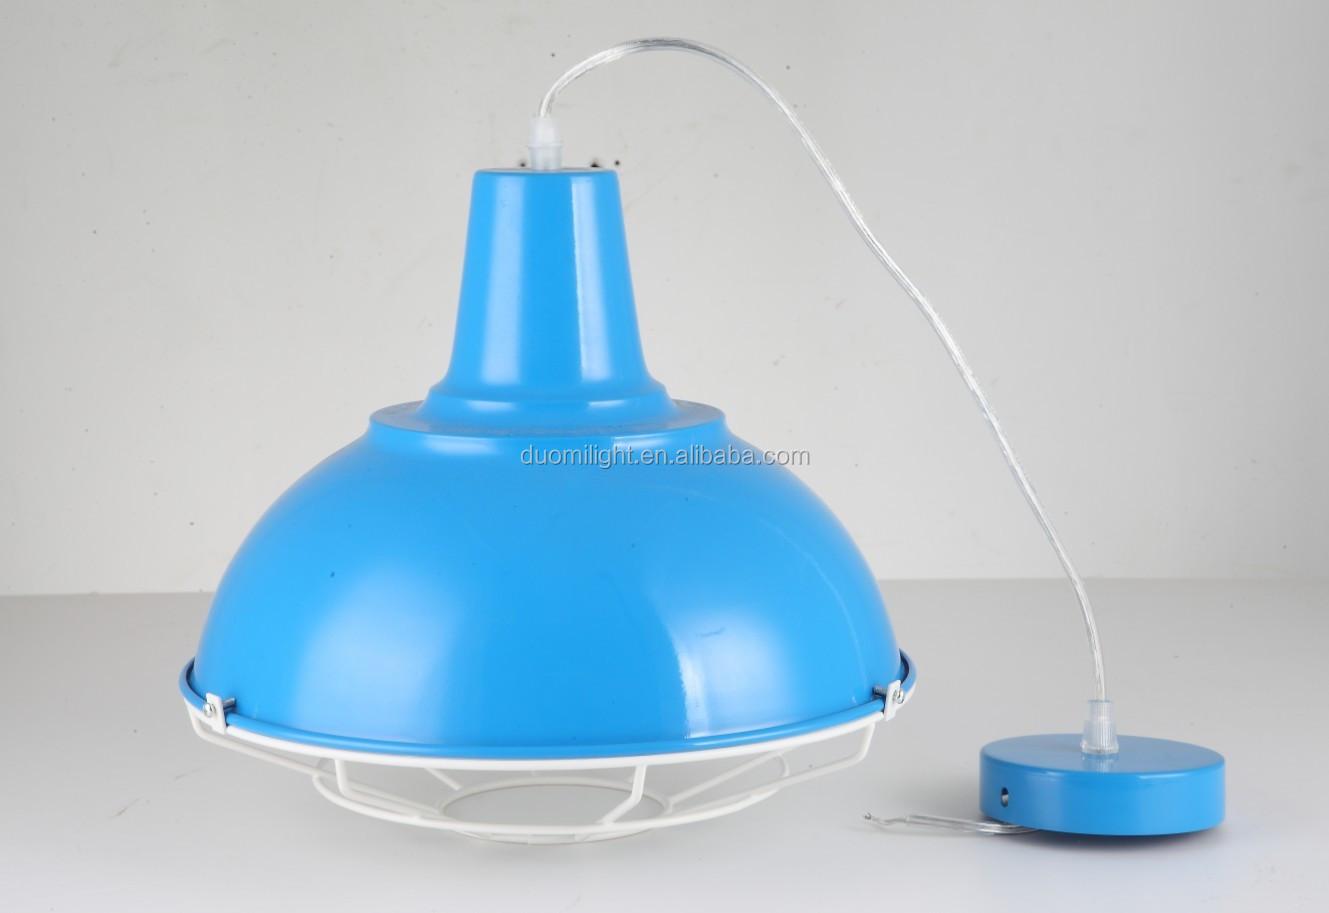 Wholesale lighting fixtures modern iron pendant lamp blue hanging lamp industrial for lighting design home